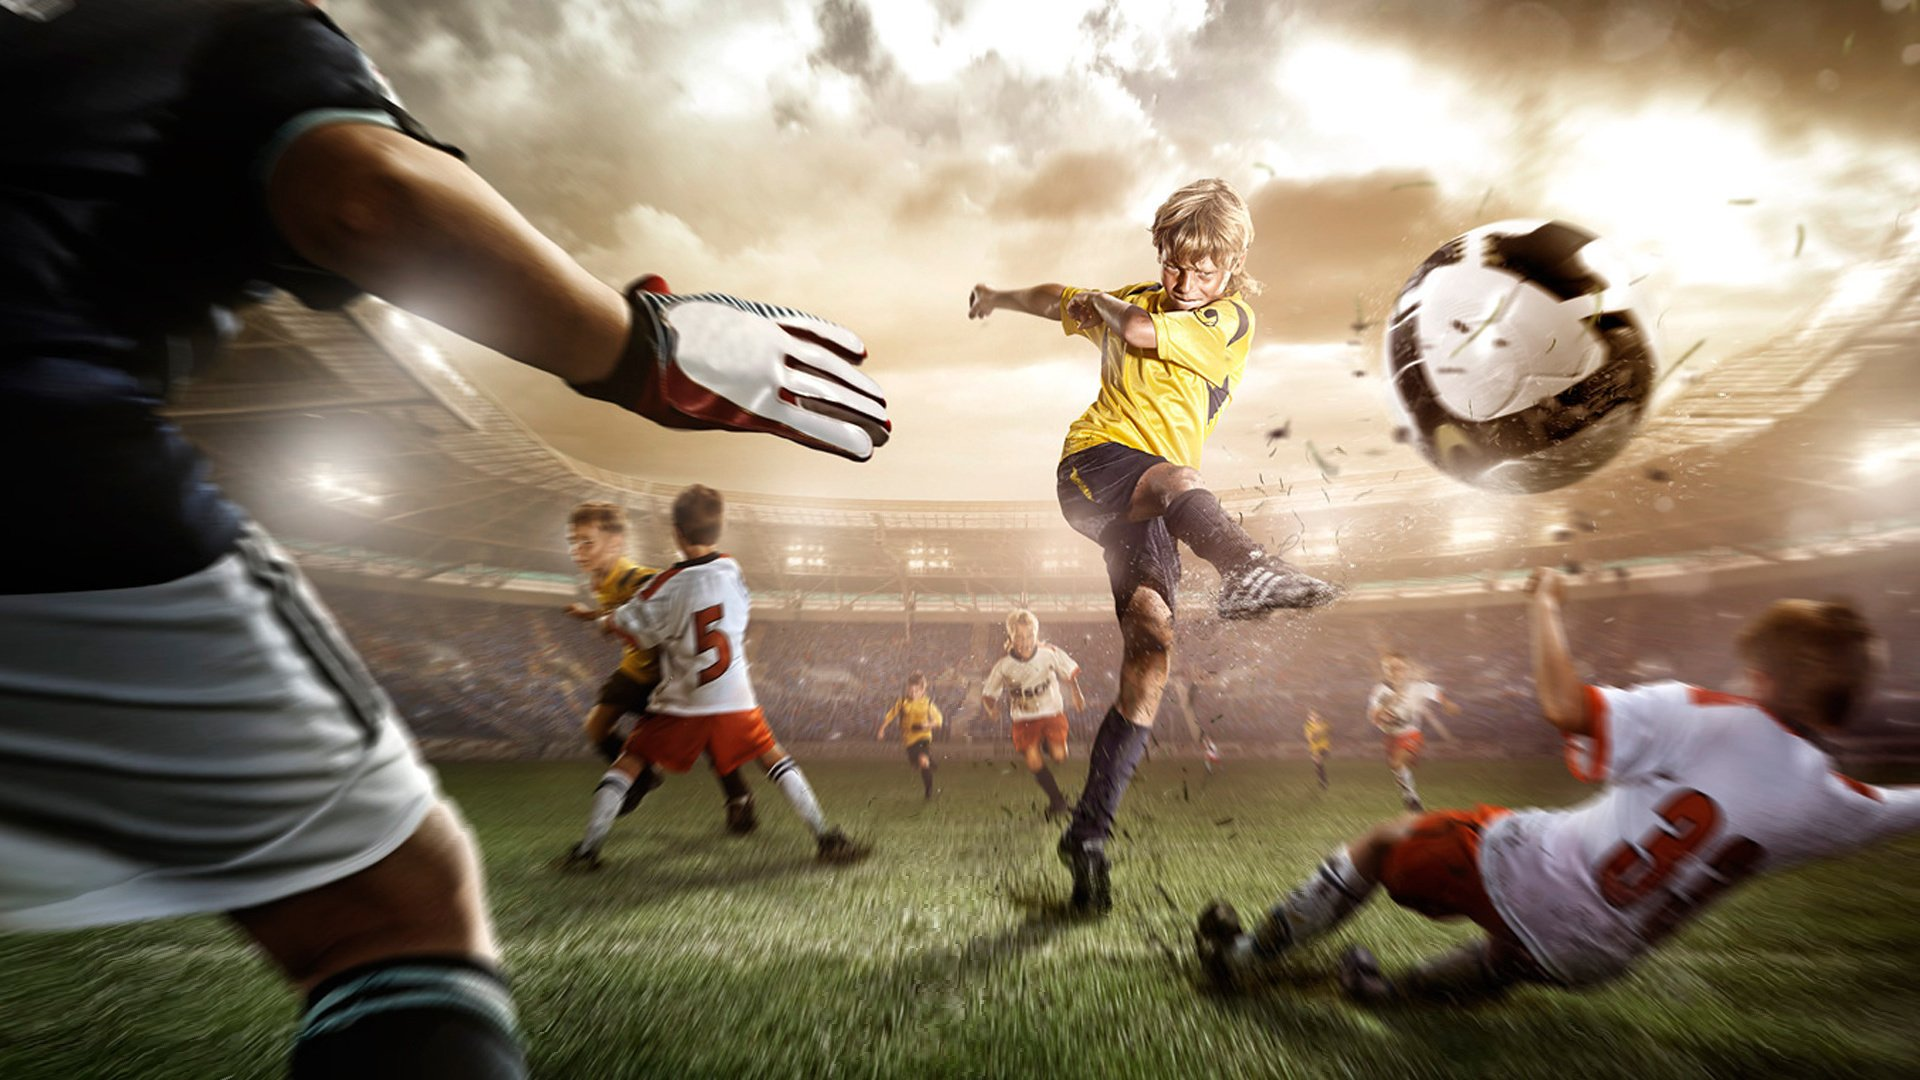 Открытки фотошоп, картинки тема футбол